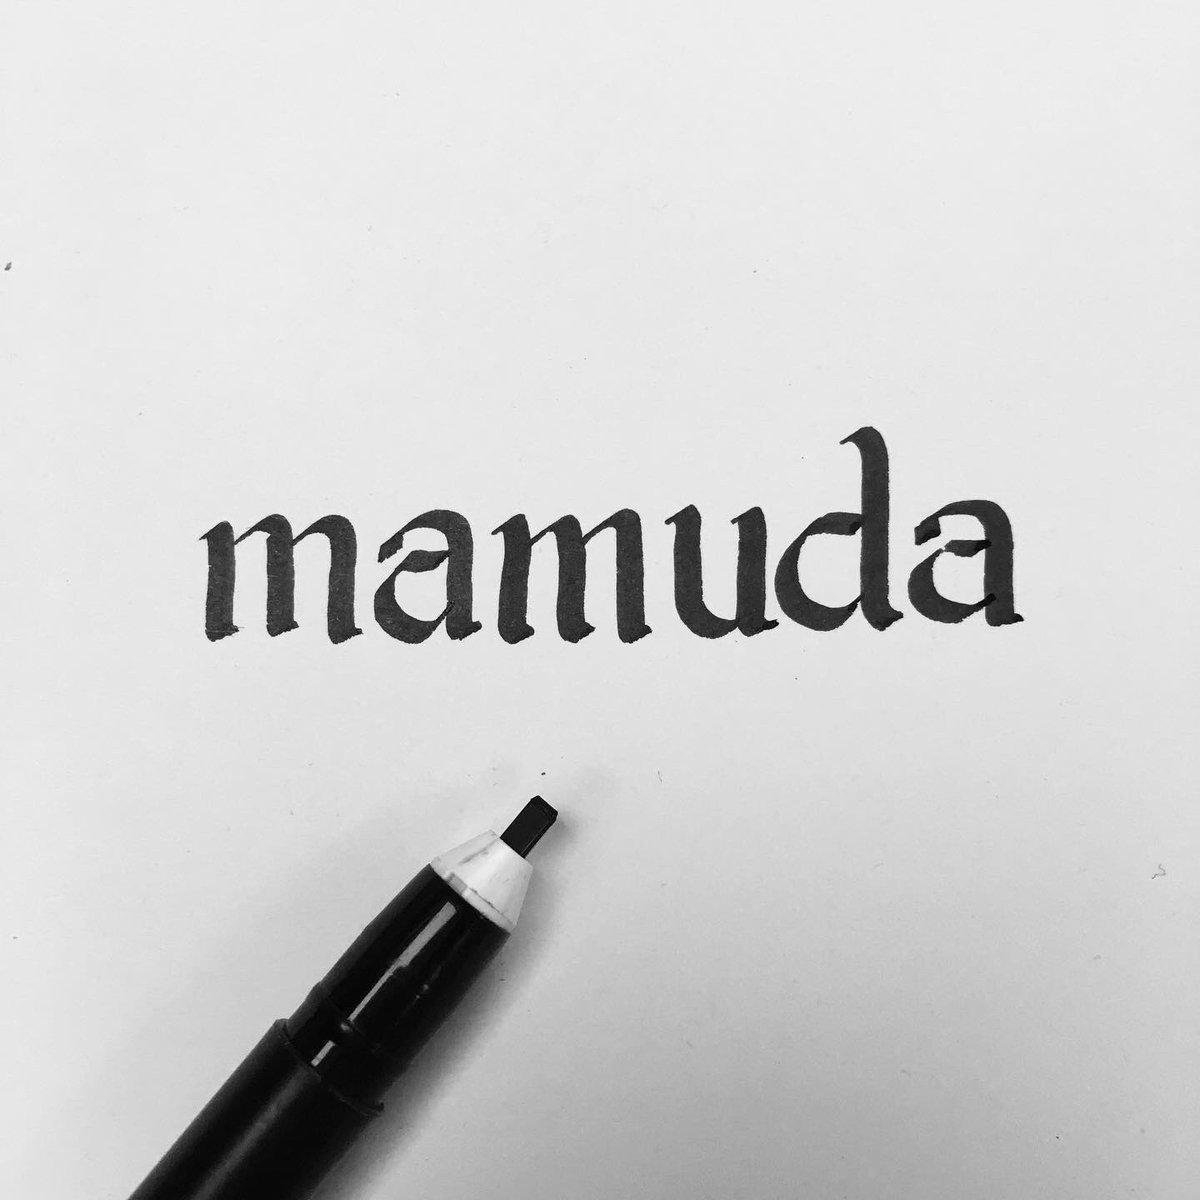 Daily Chamoru 039: Mamuda - dressed up, dolled up, change clothes // #chamoru #chamorro #cnmi #guam #rota #saipan #tinian #art #type #calligraphypic.twitter.com/55bLJwCQed